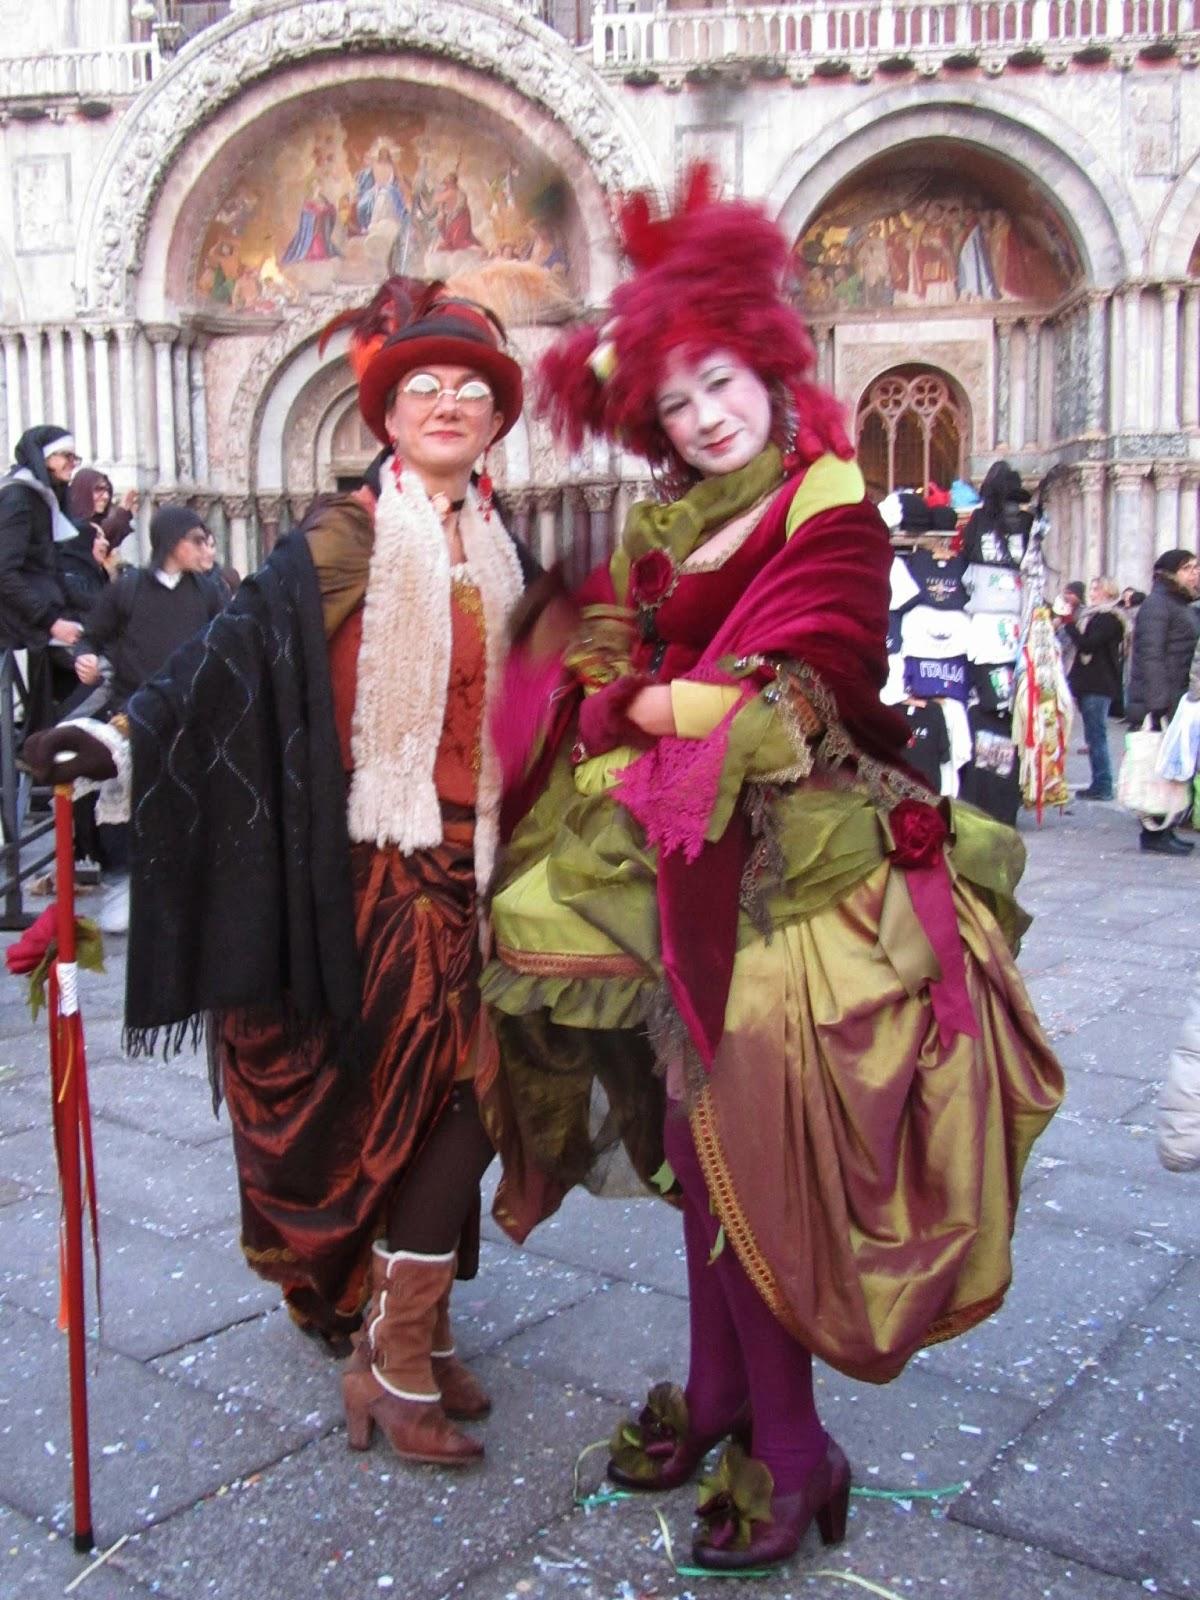 Carnival in Venice: costumes